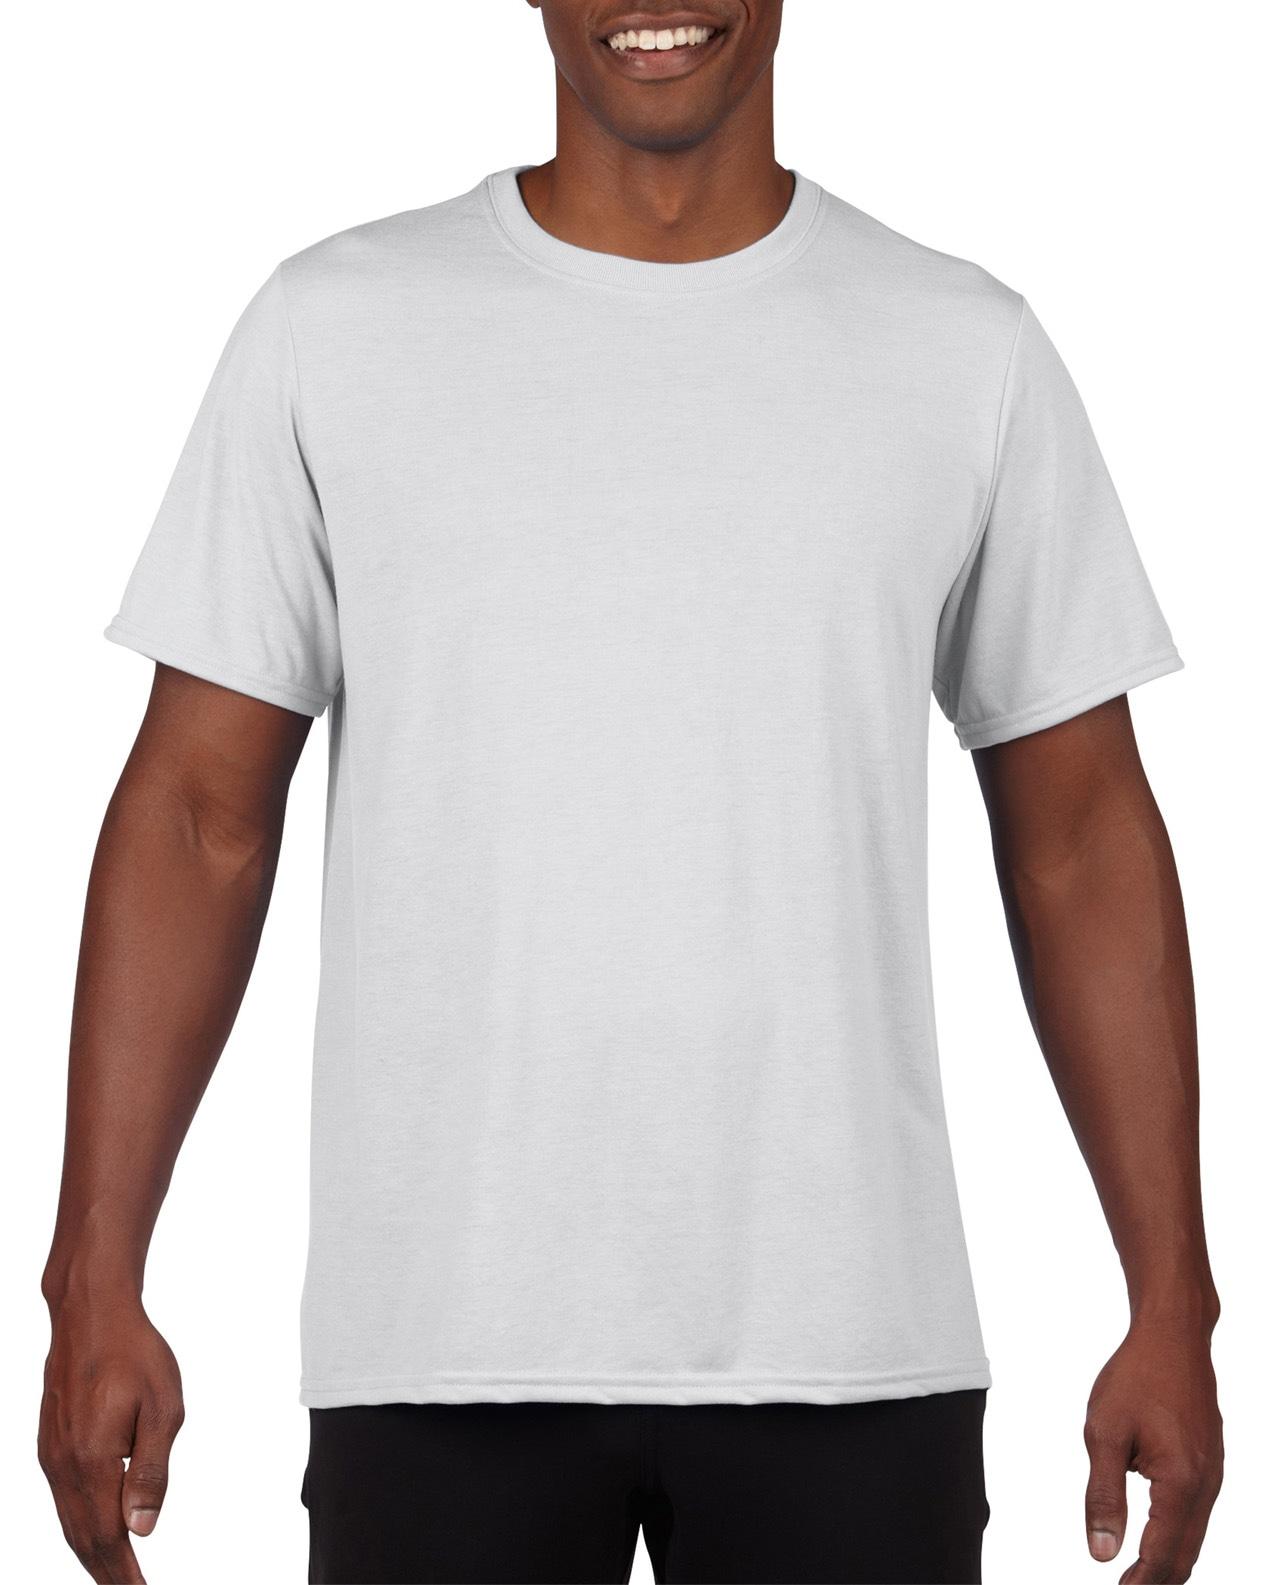 Apparel printing athletics gildan performance t shirt for Gildan t shirt printing